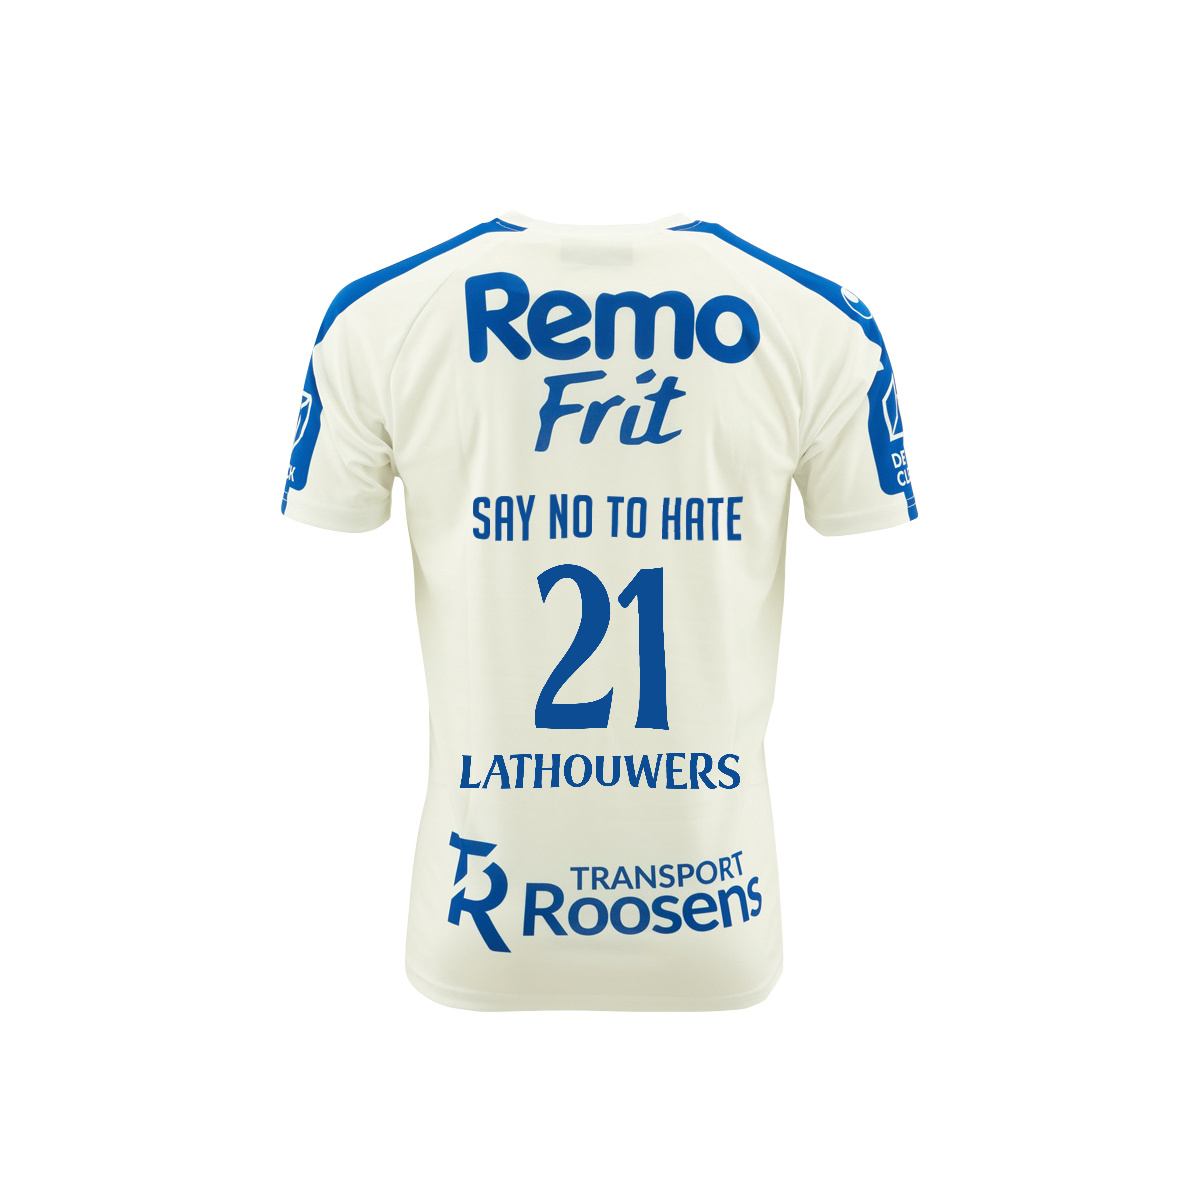 Topfanz Say No To Hate - shirt Lathouwers